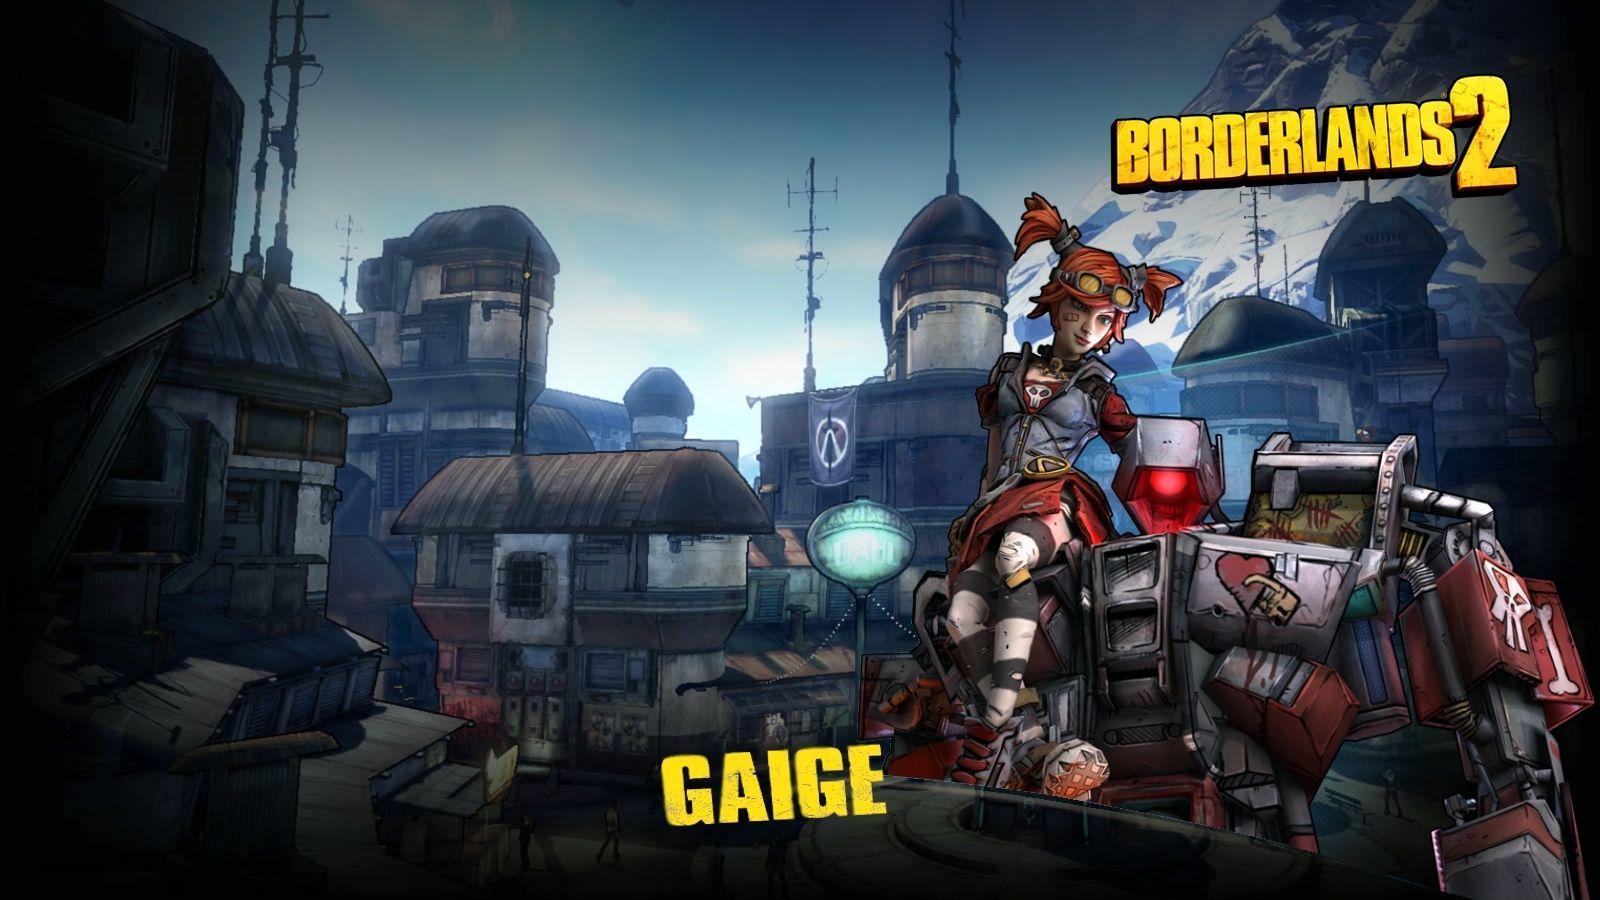 Borderlands 2 Best Weapons For Gaige